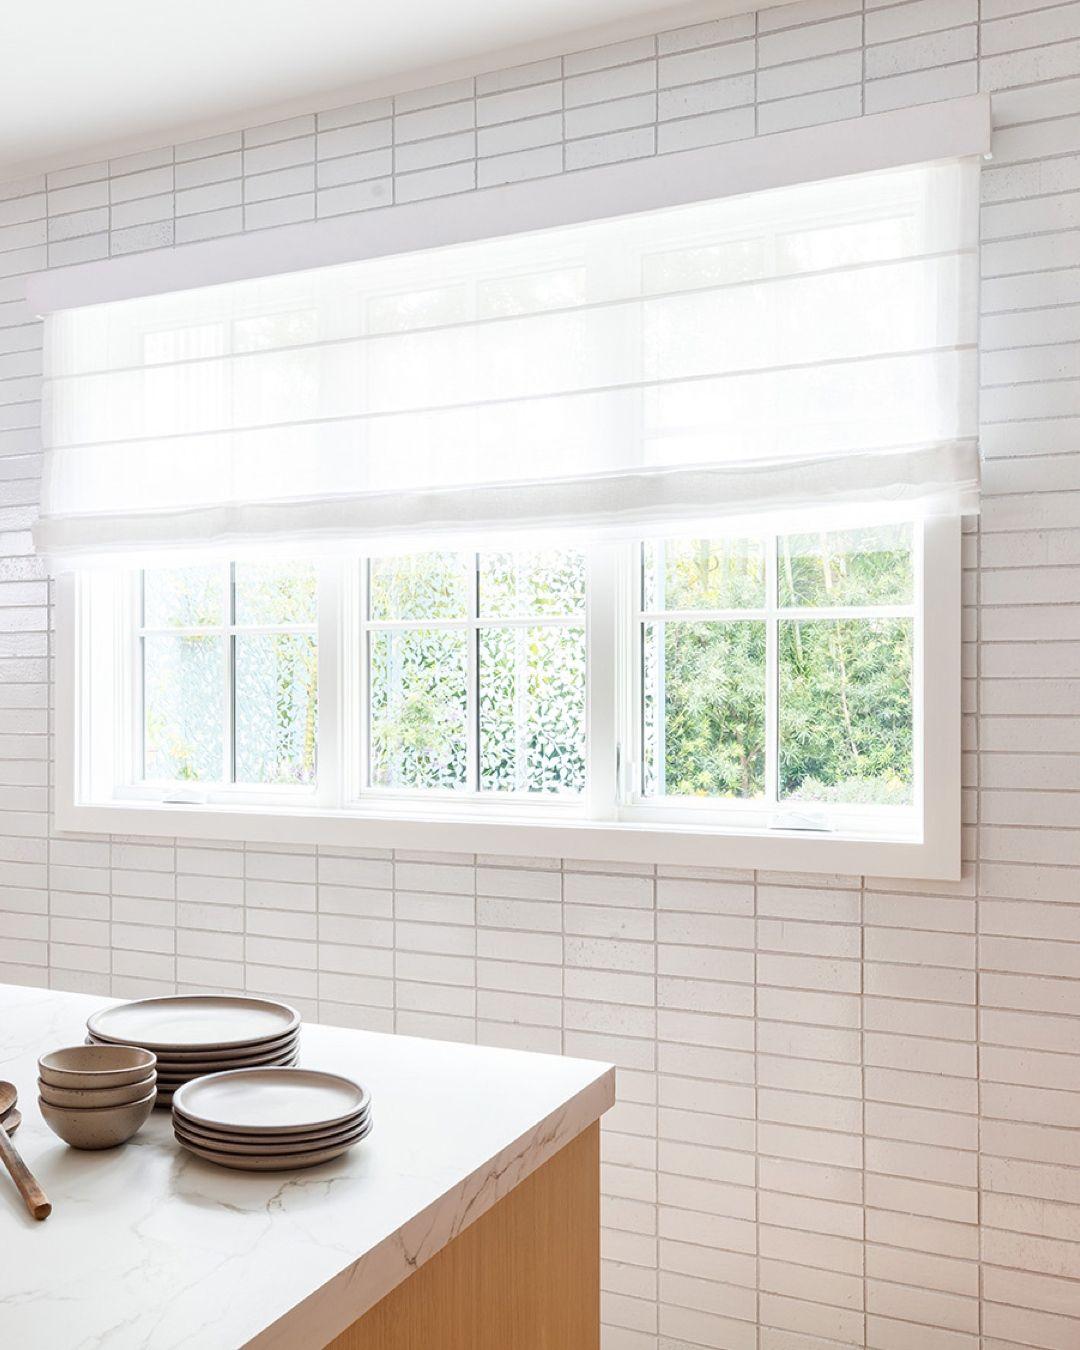 82 Amazing Kitchen Window Treatments Ideas In 2021 Kitchen Window Treatments Home The Shade Store